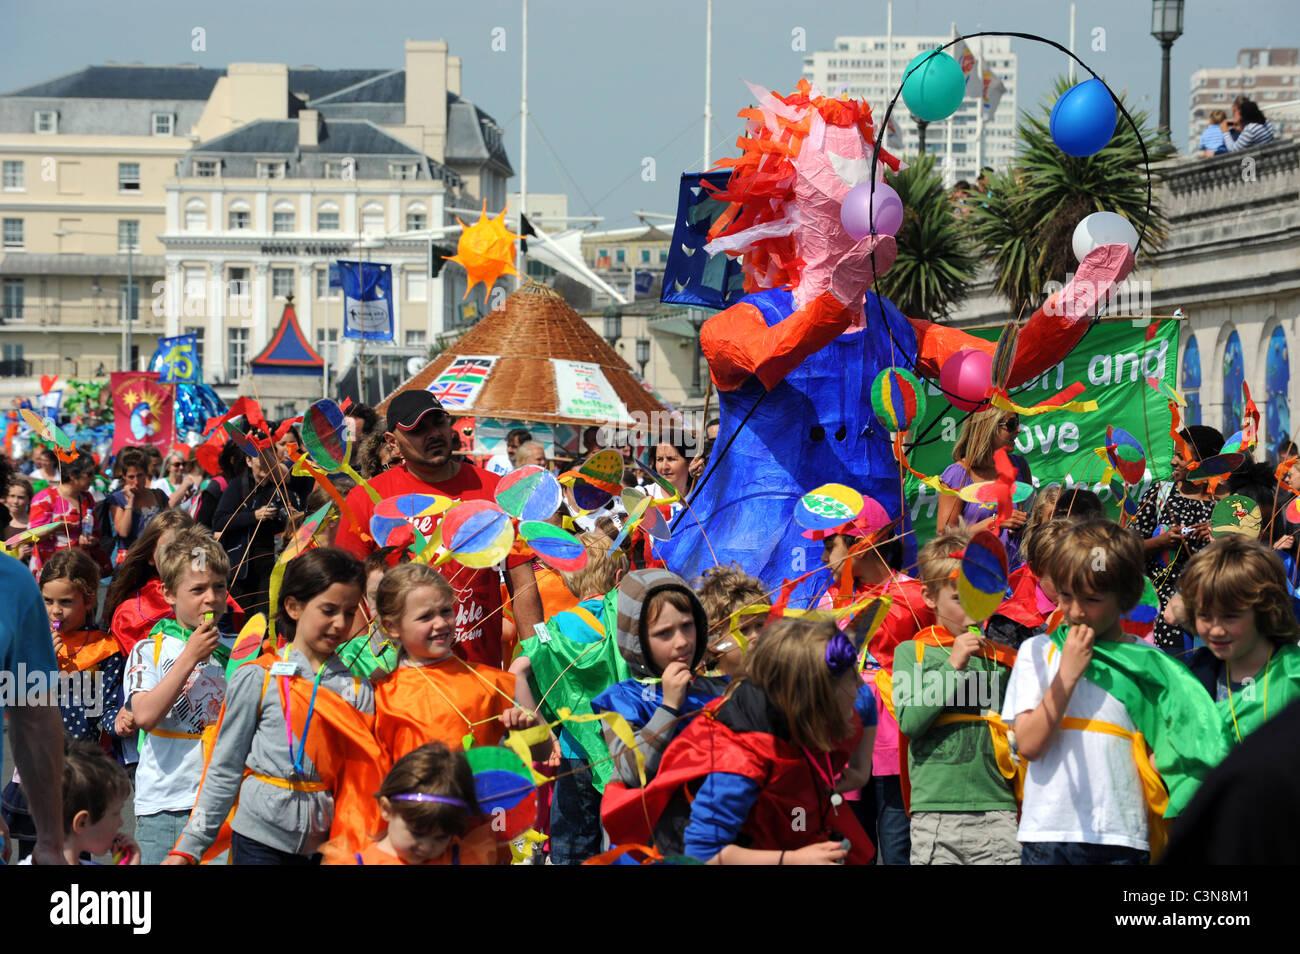 Brighton Festival Children's Parade 2011 - Stock Image